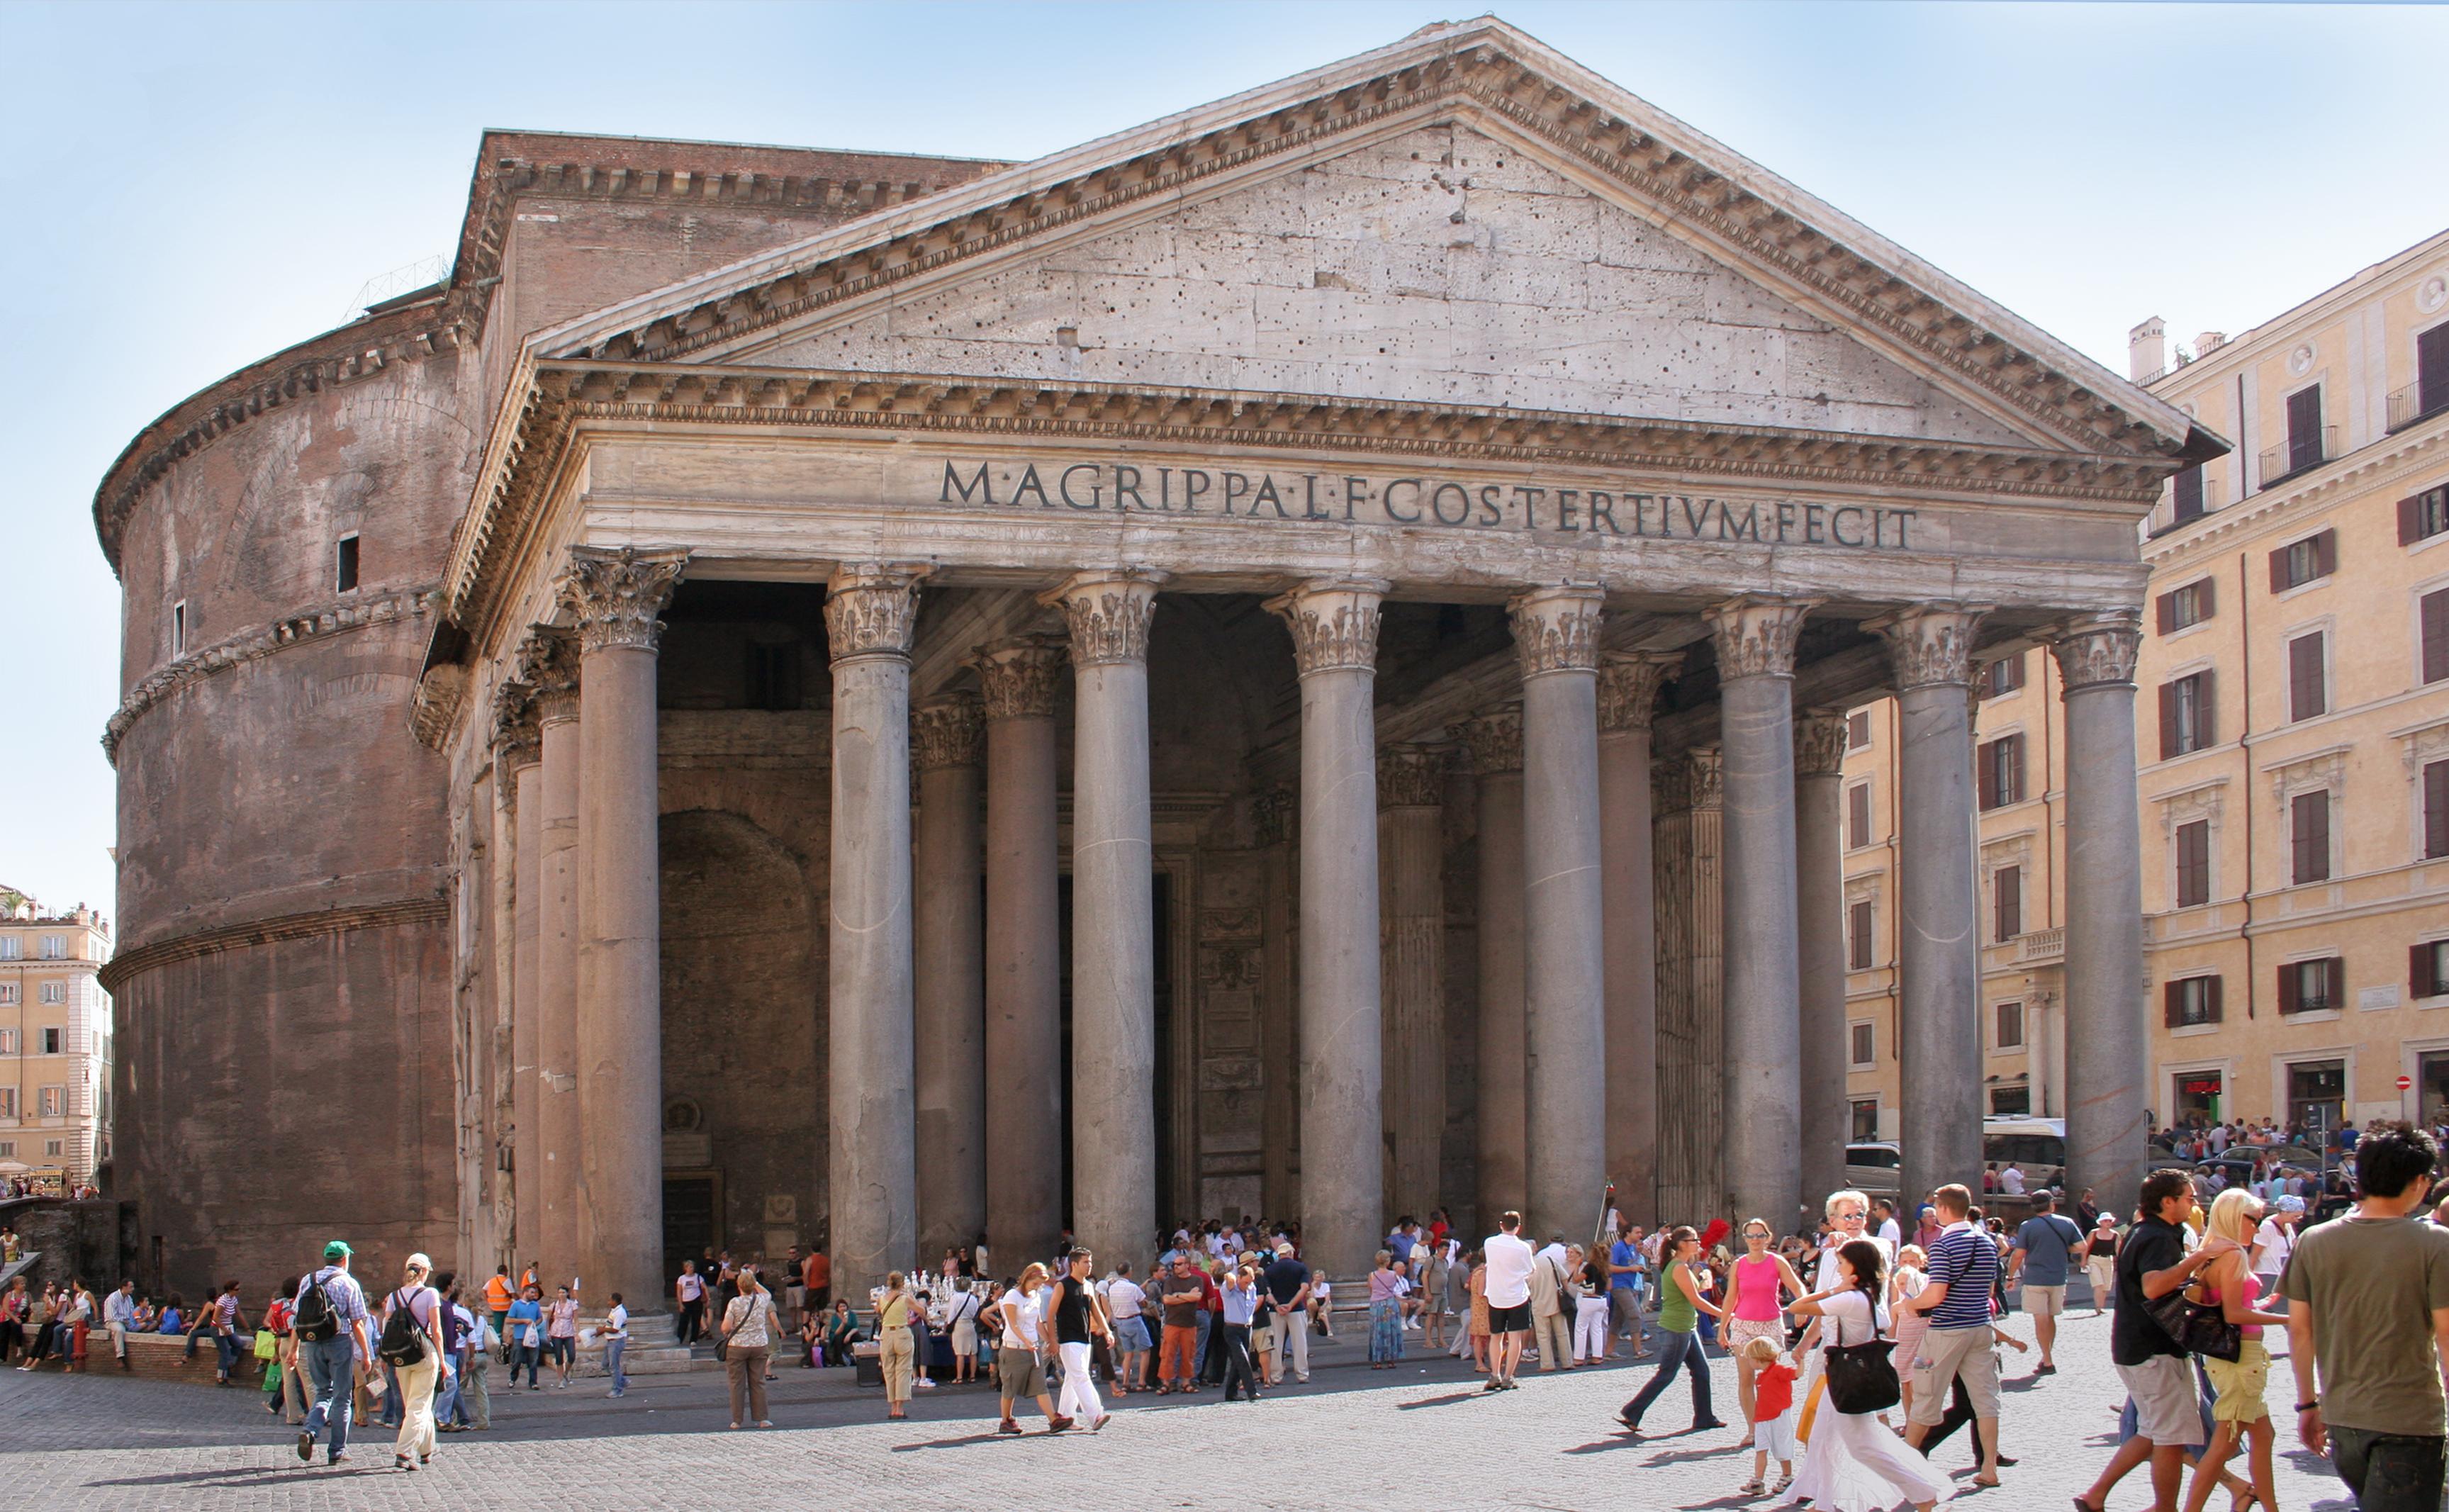 Pantheon i Rom er stor turistattrakton. (Foto: Roberta Dragan | CC 2.5)